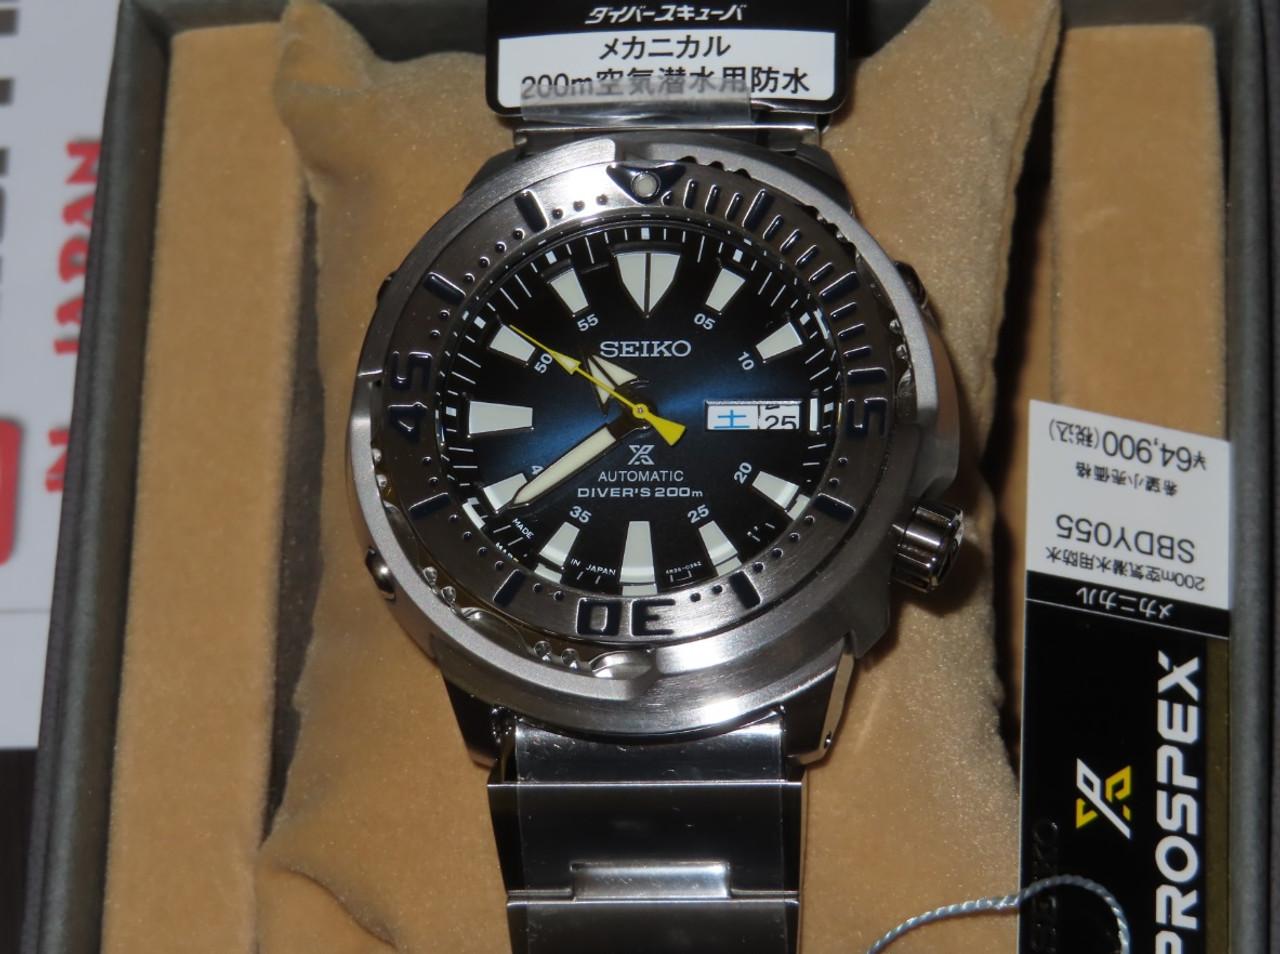 Seiko Prospex Baby Tuna Blue Gradient SBDY055